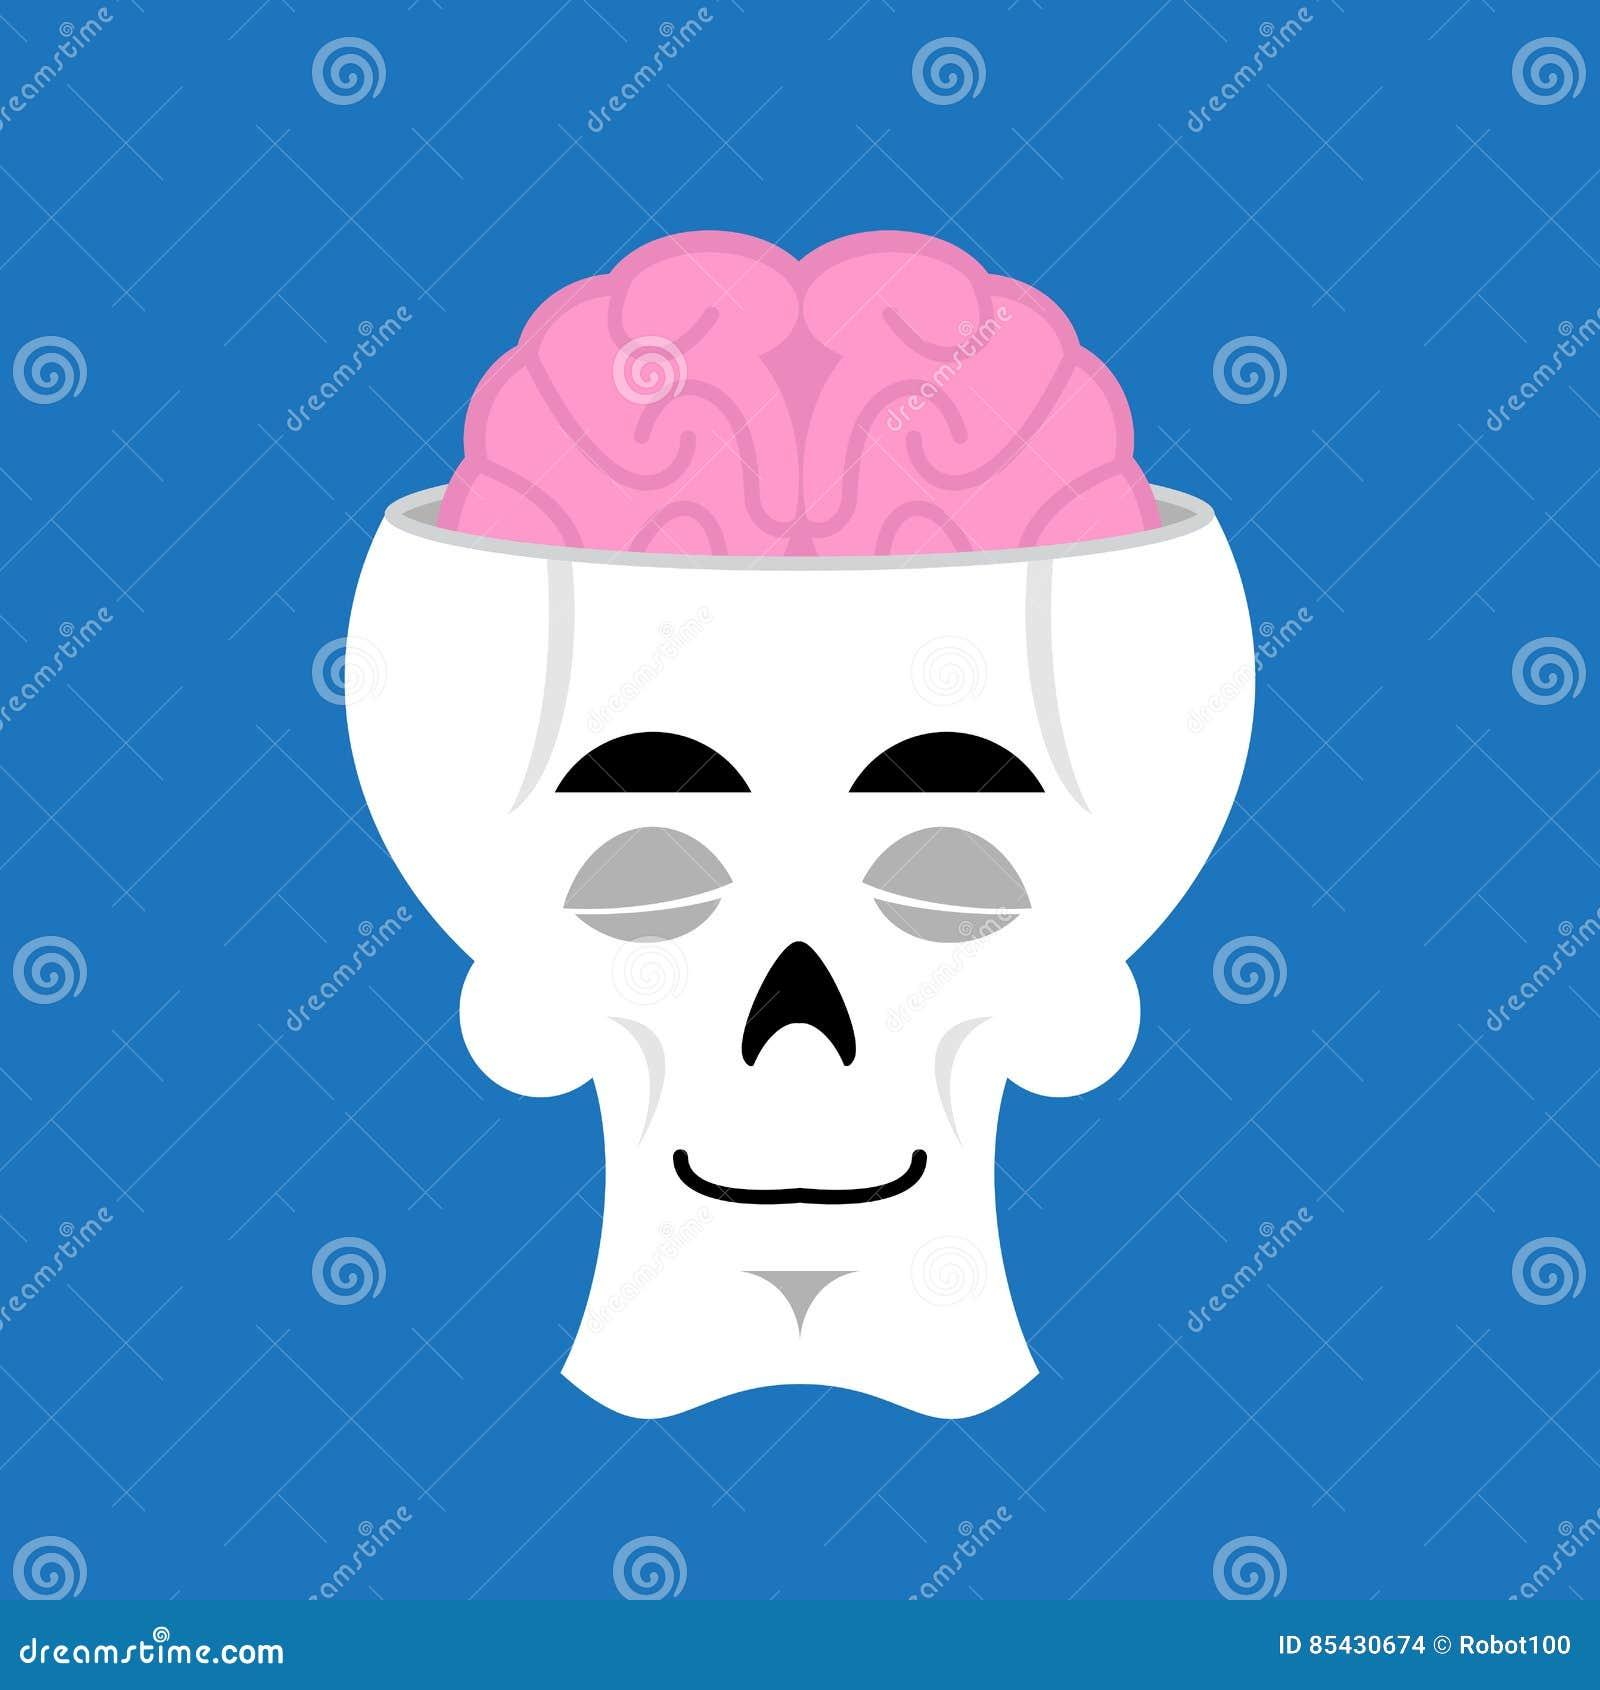 Skull And Brain Sleeps Emoji. Skeleton Head Asleep Emotion